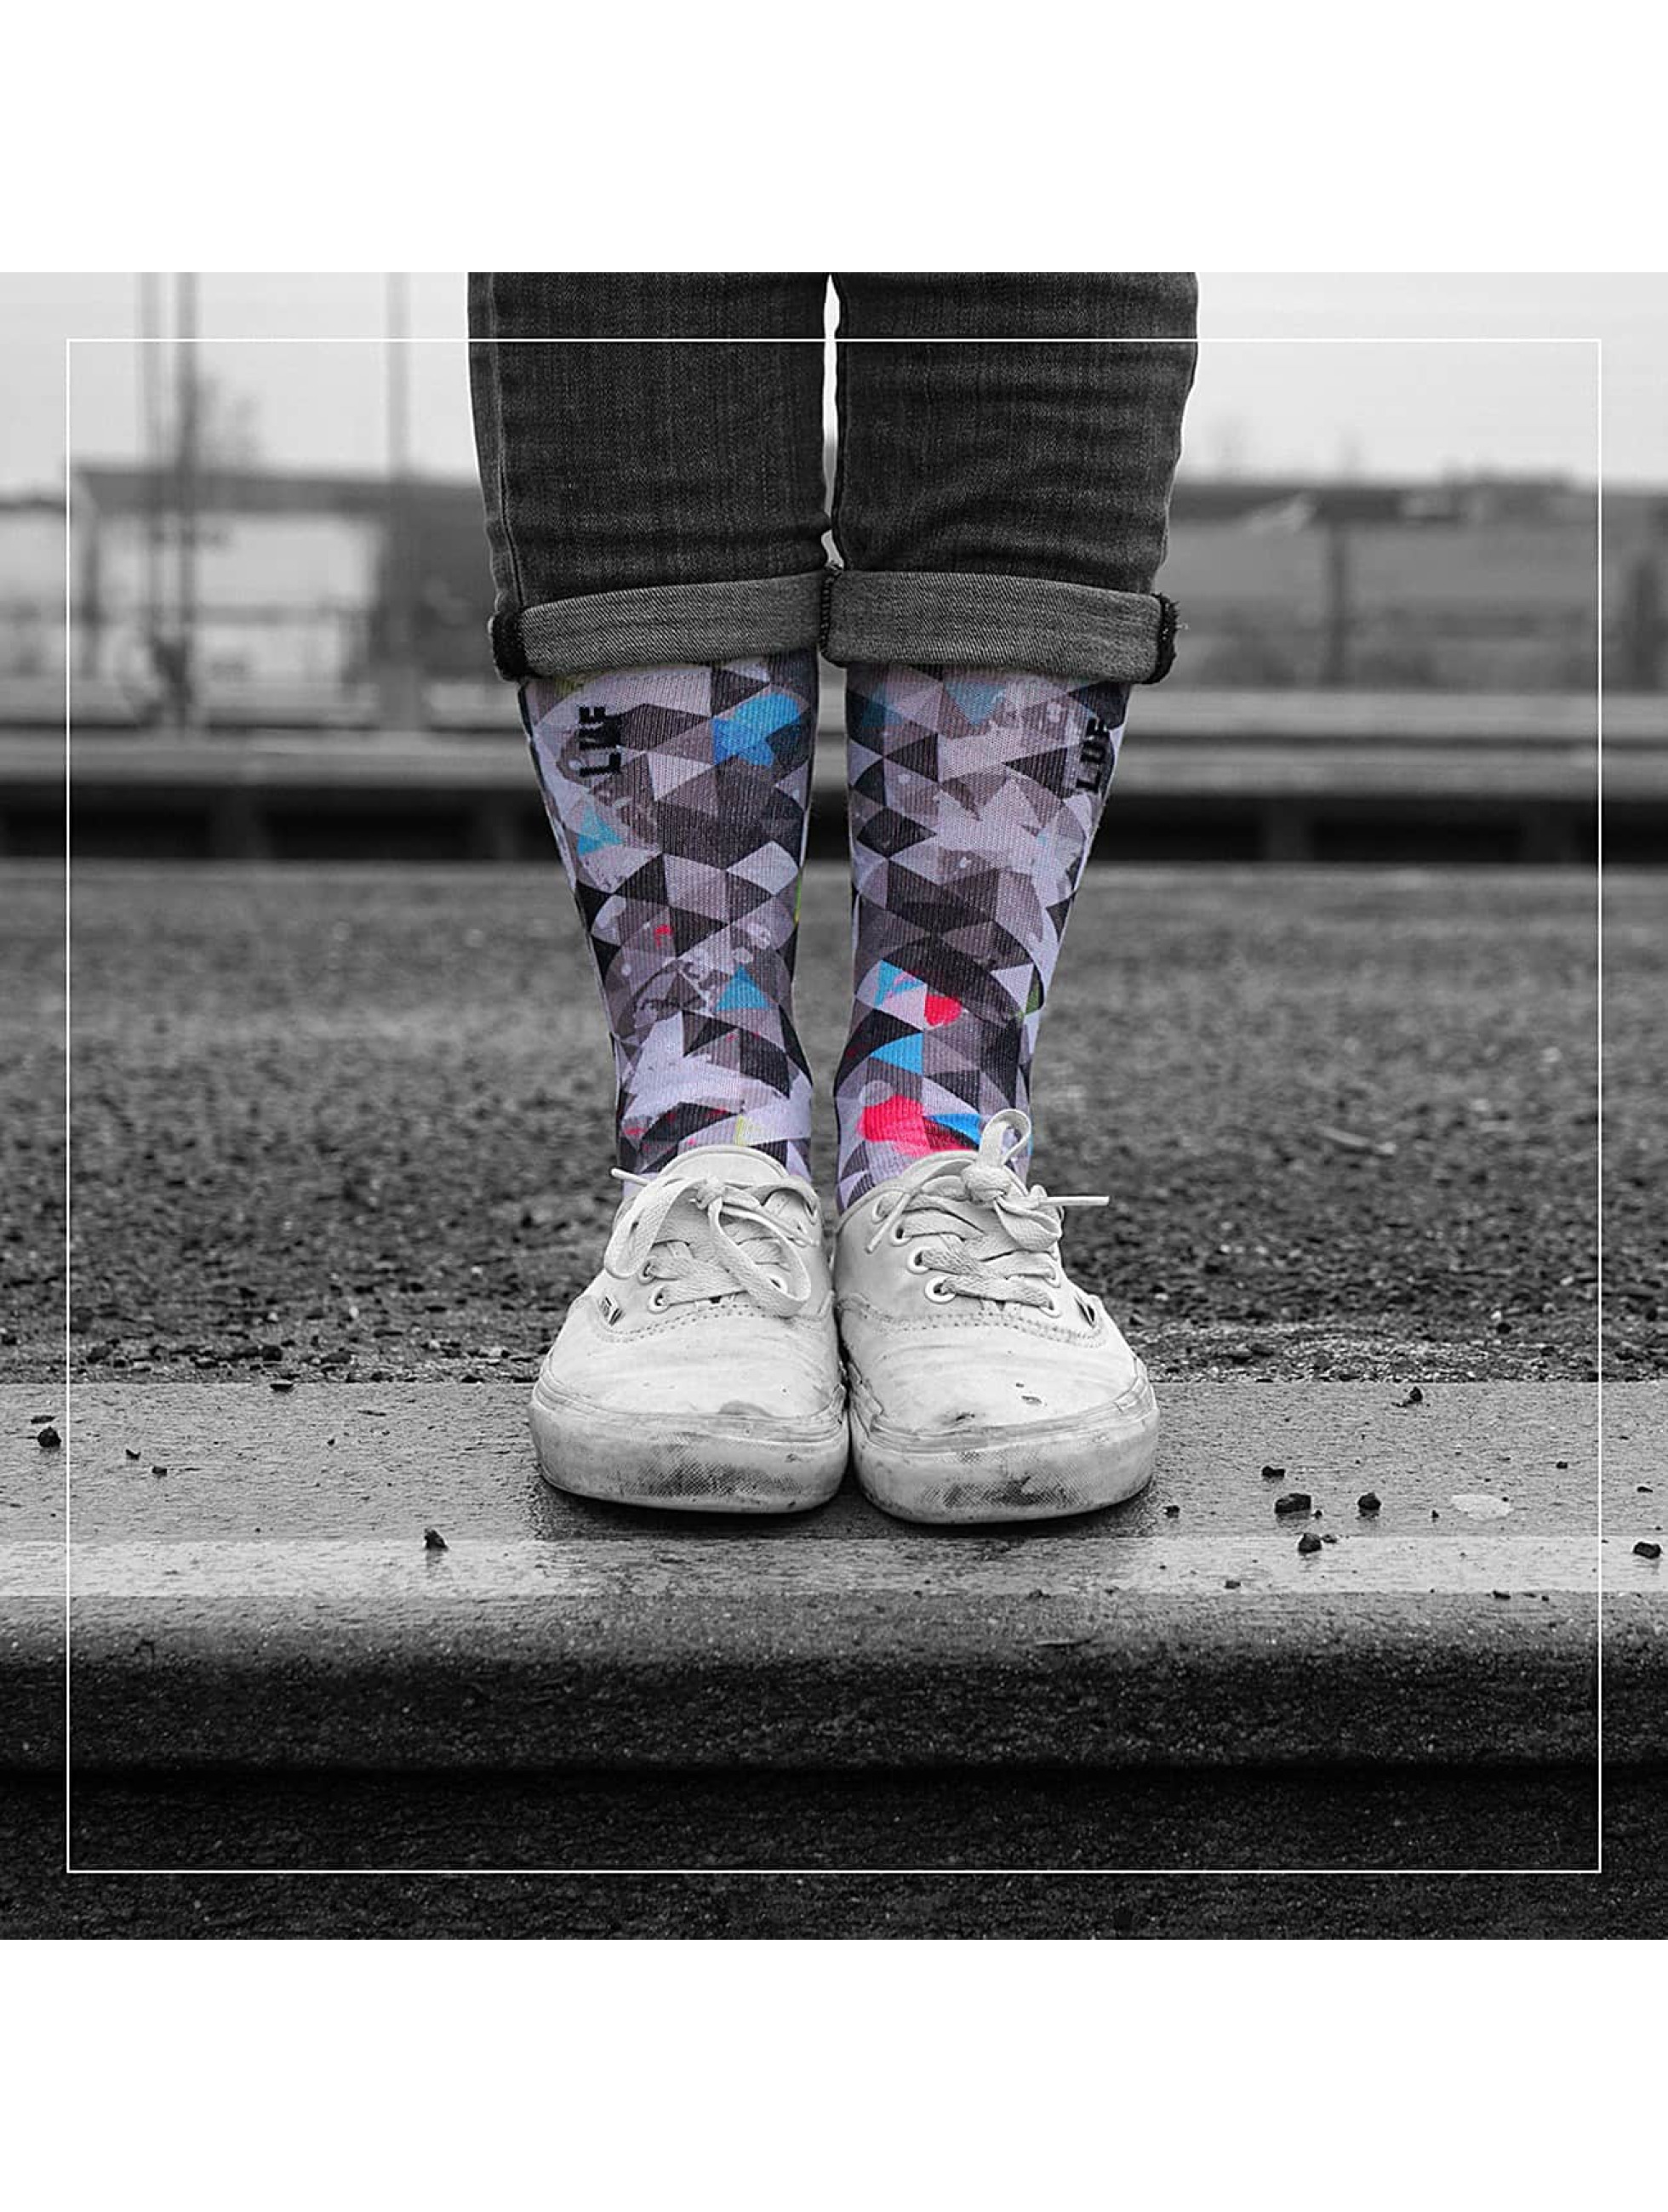 LUF SOX Socks Geogram colored